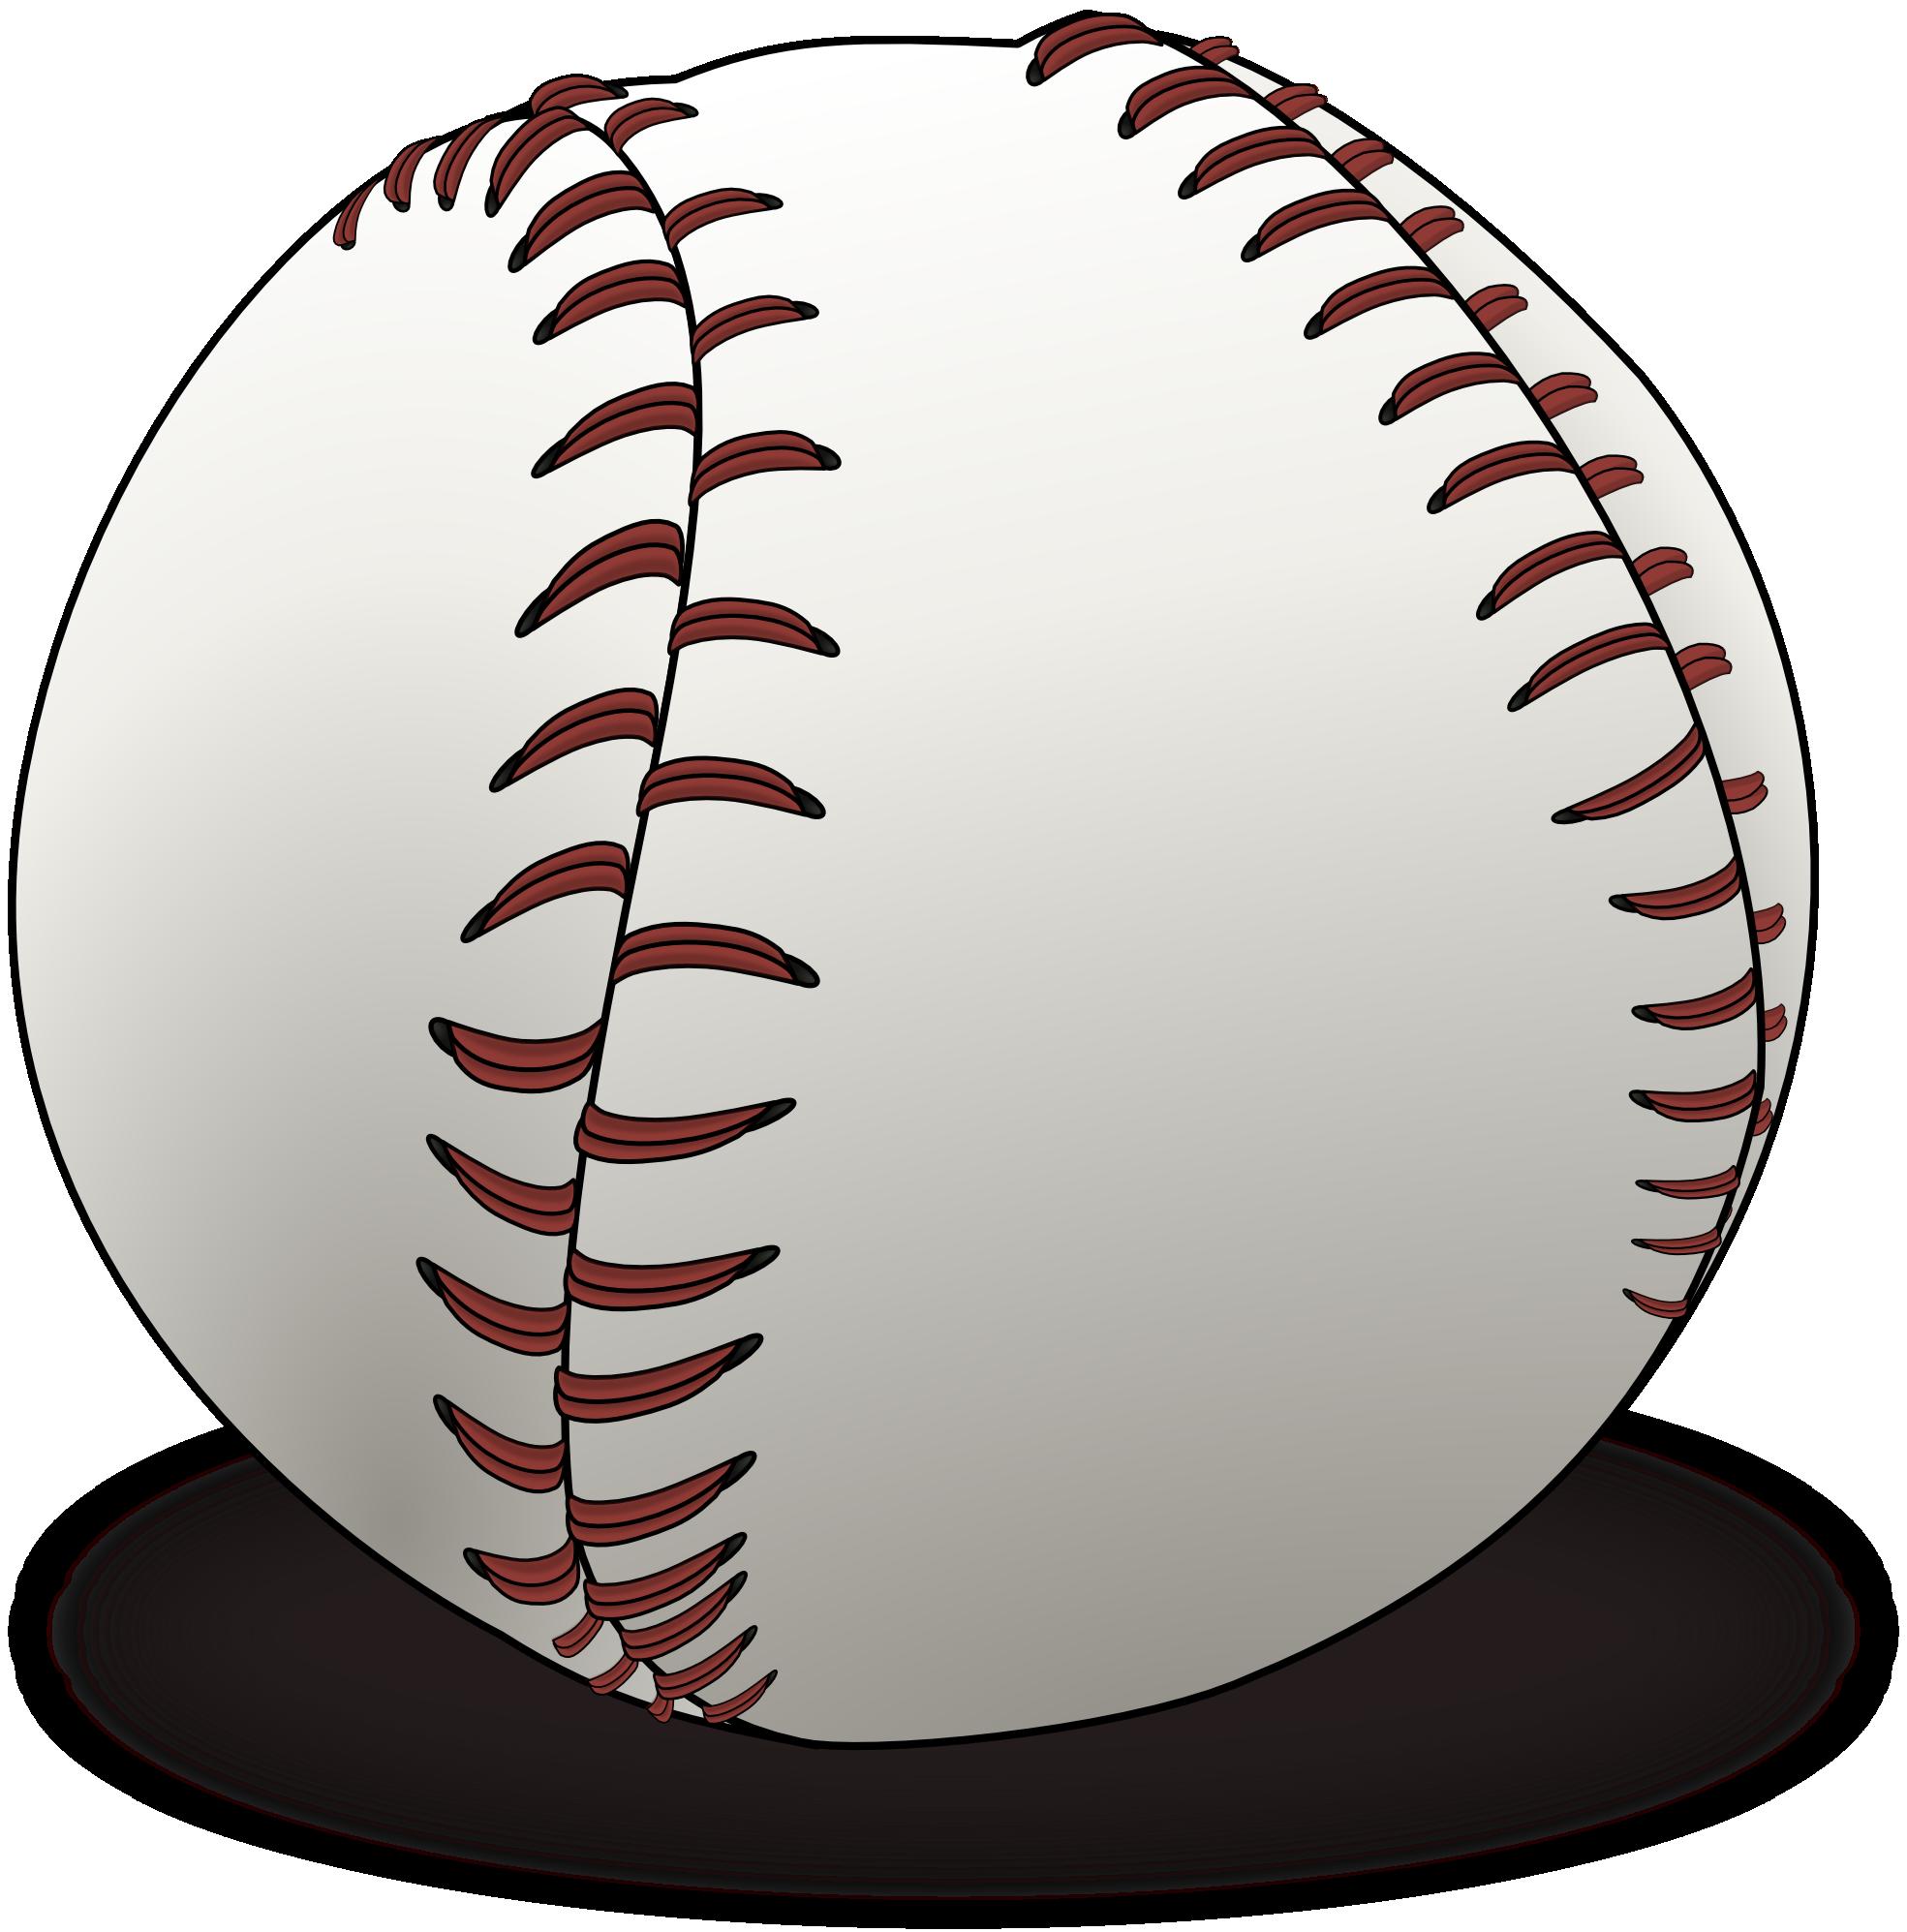 baseball ball vector clipart panda free clipart images baseball bat clip art images free baseball bat clipart solid